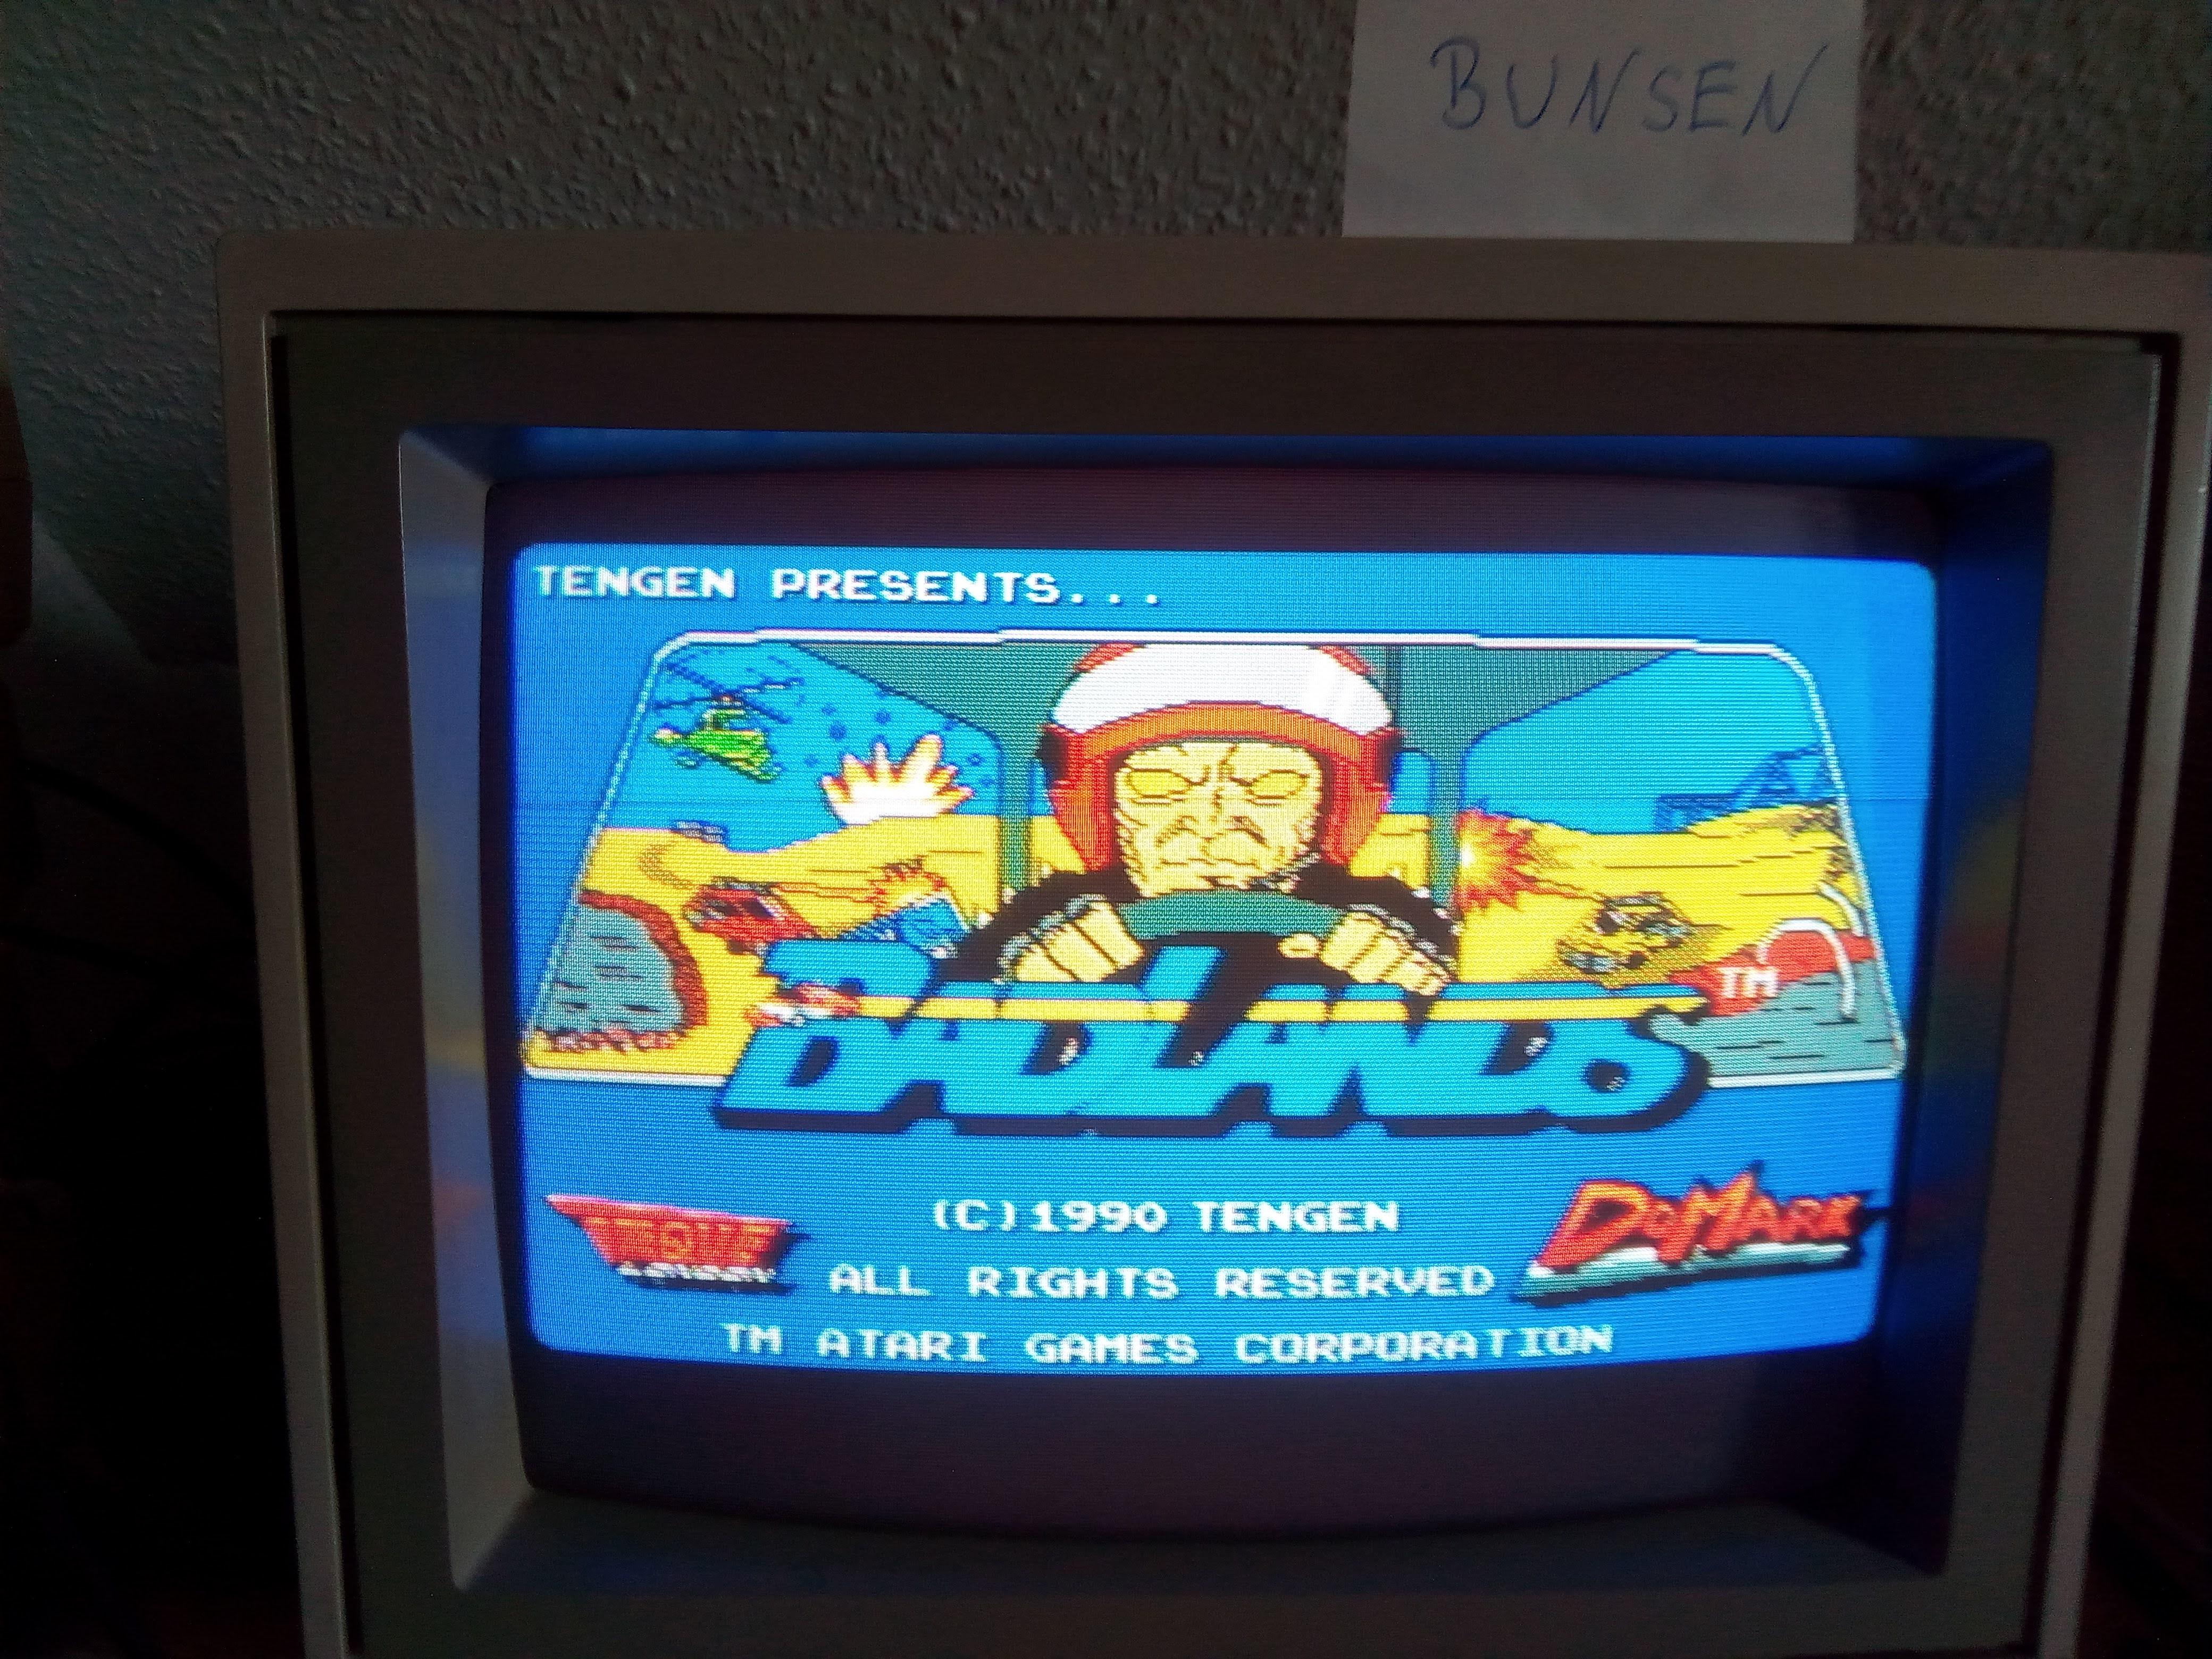 Bunsen: Badlands (Amiga) 8,320 points on 2021-05-29 03:48:16